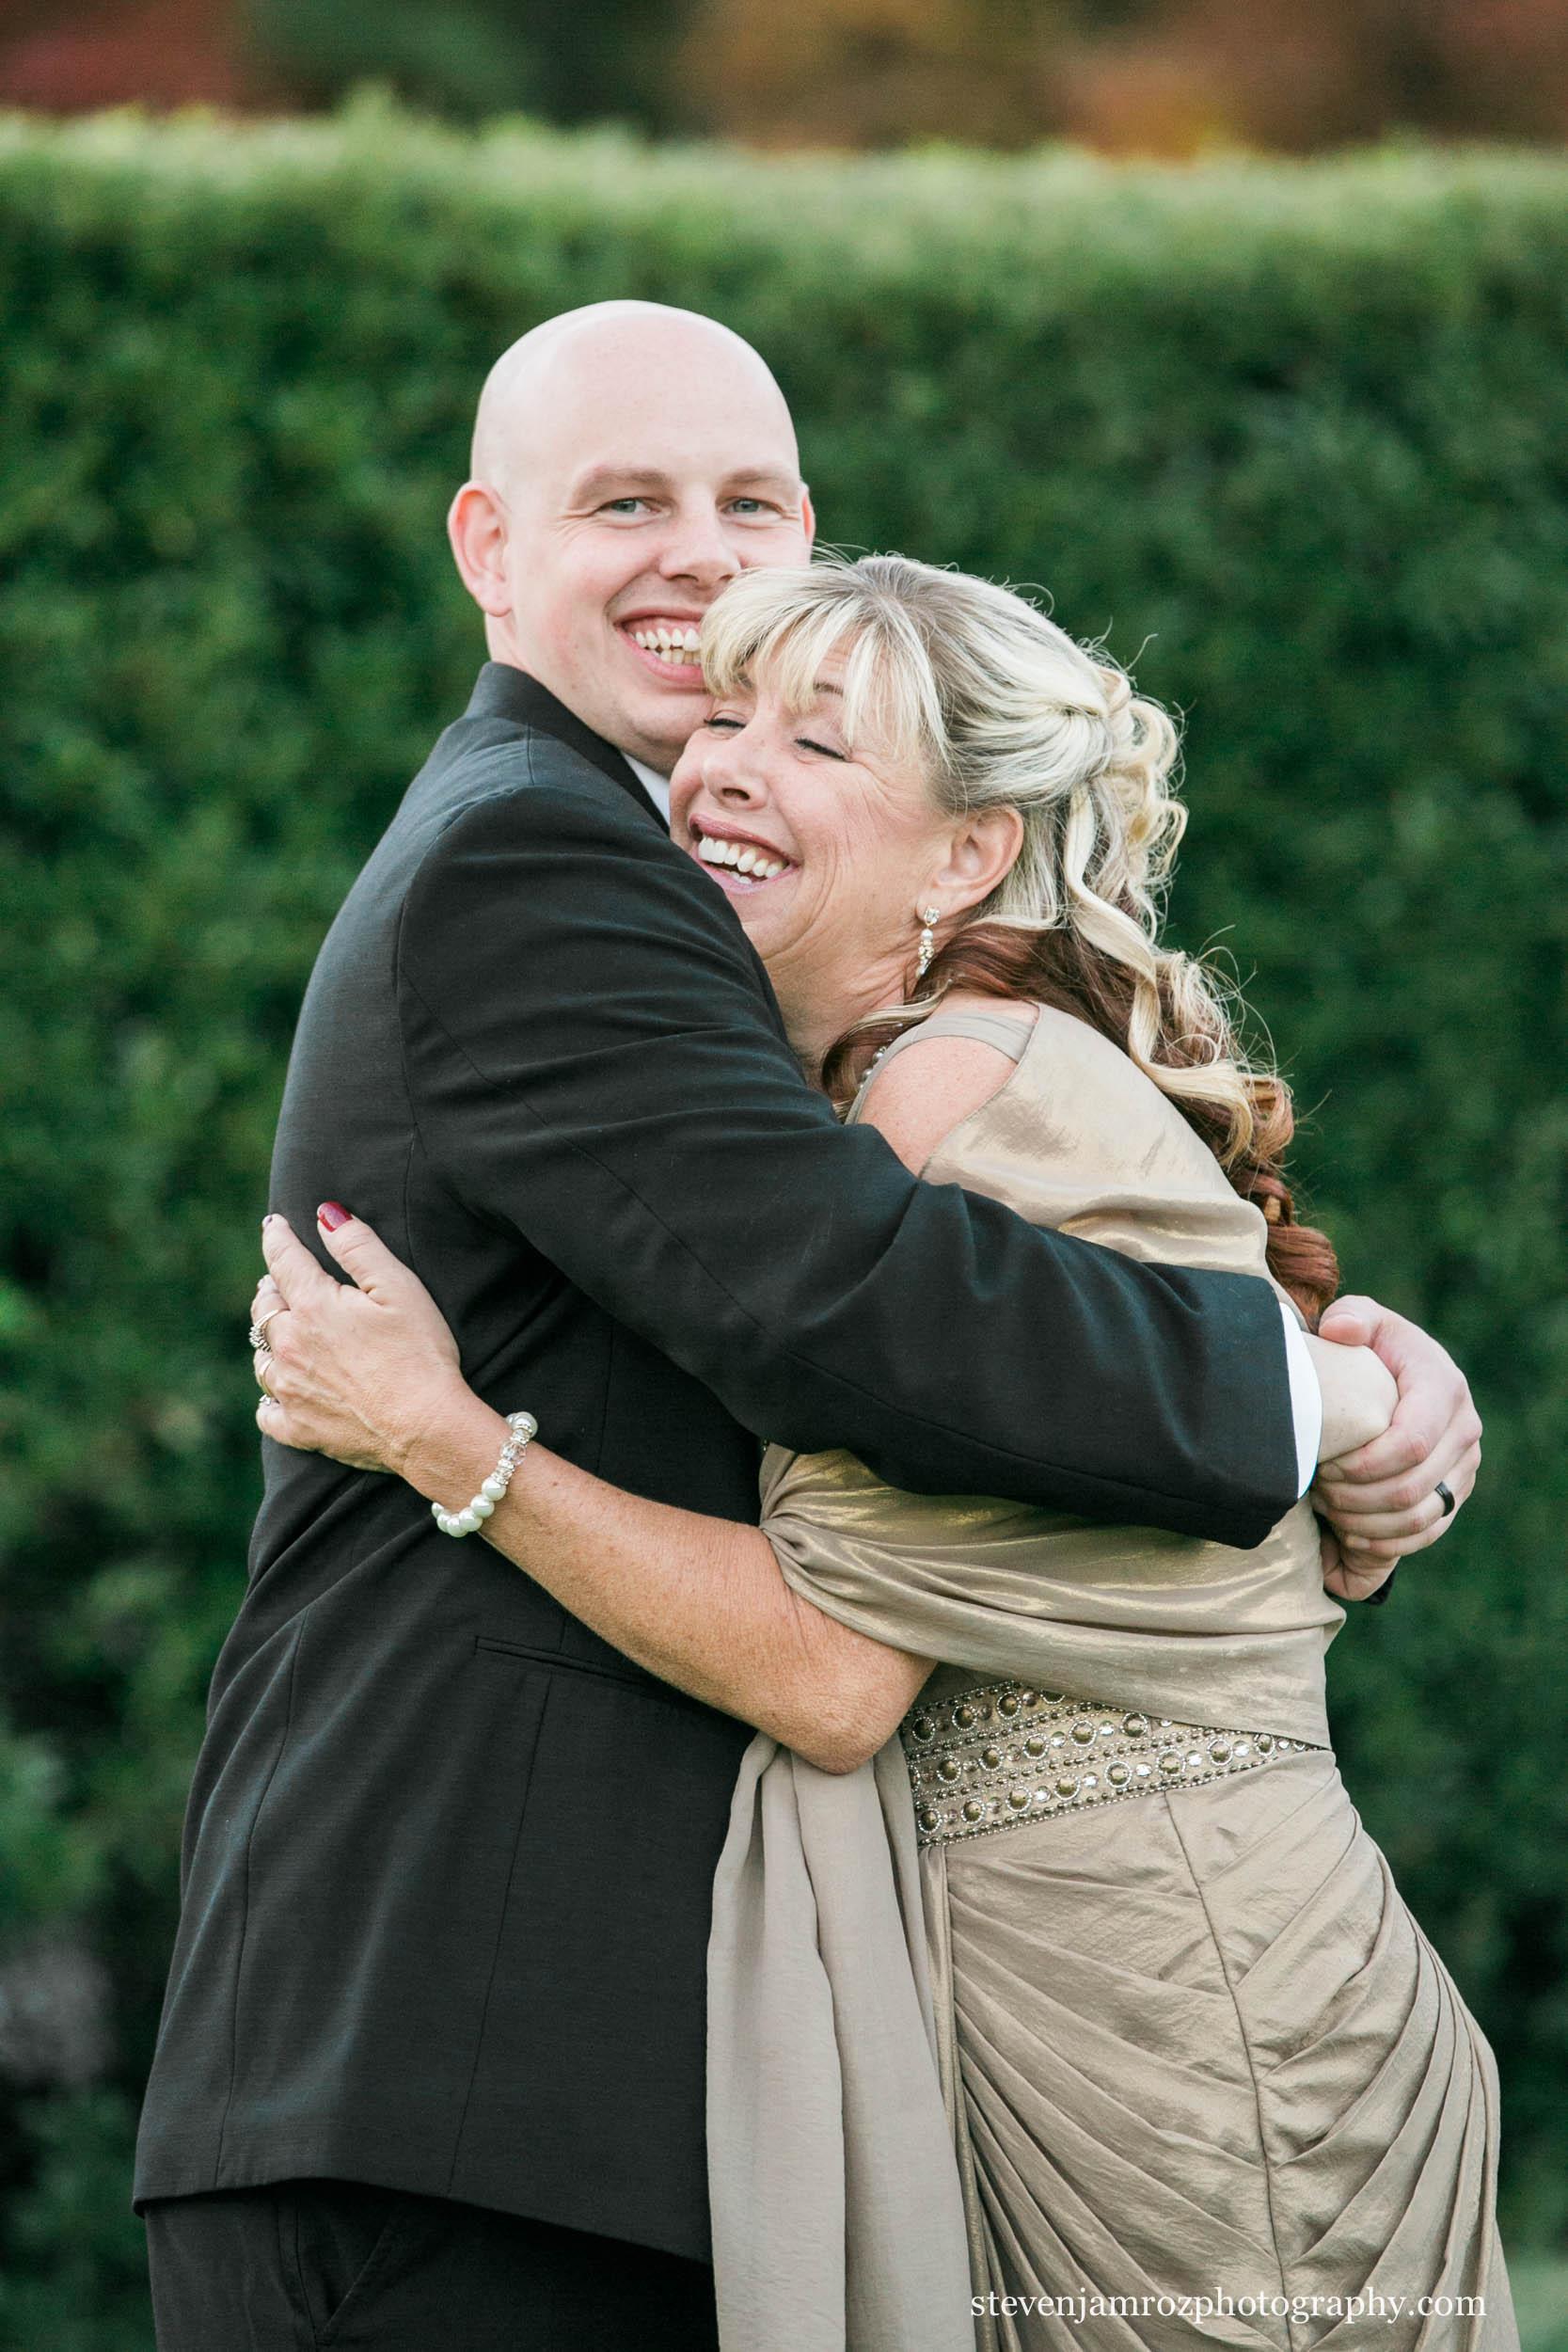 mother-groom-hug-raleigh-steven-jamroz-photography-0304.jpg